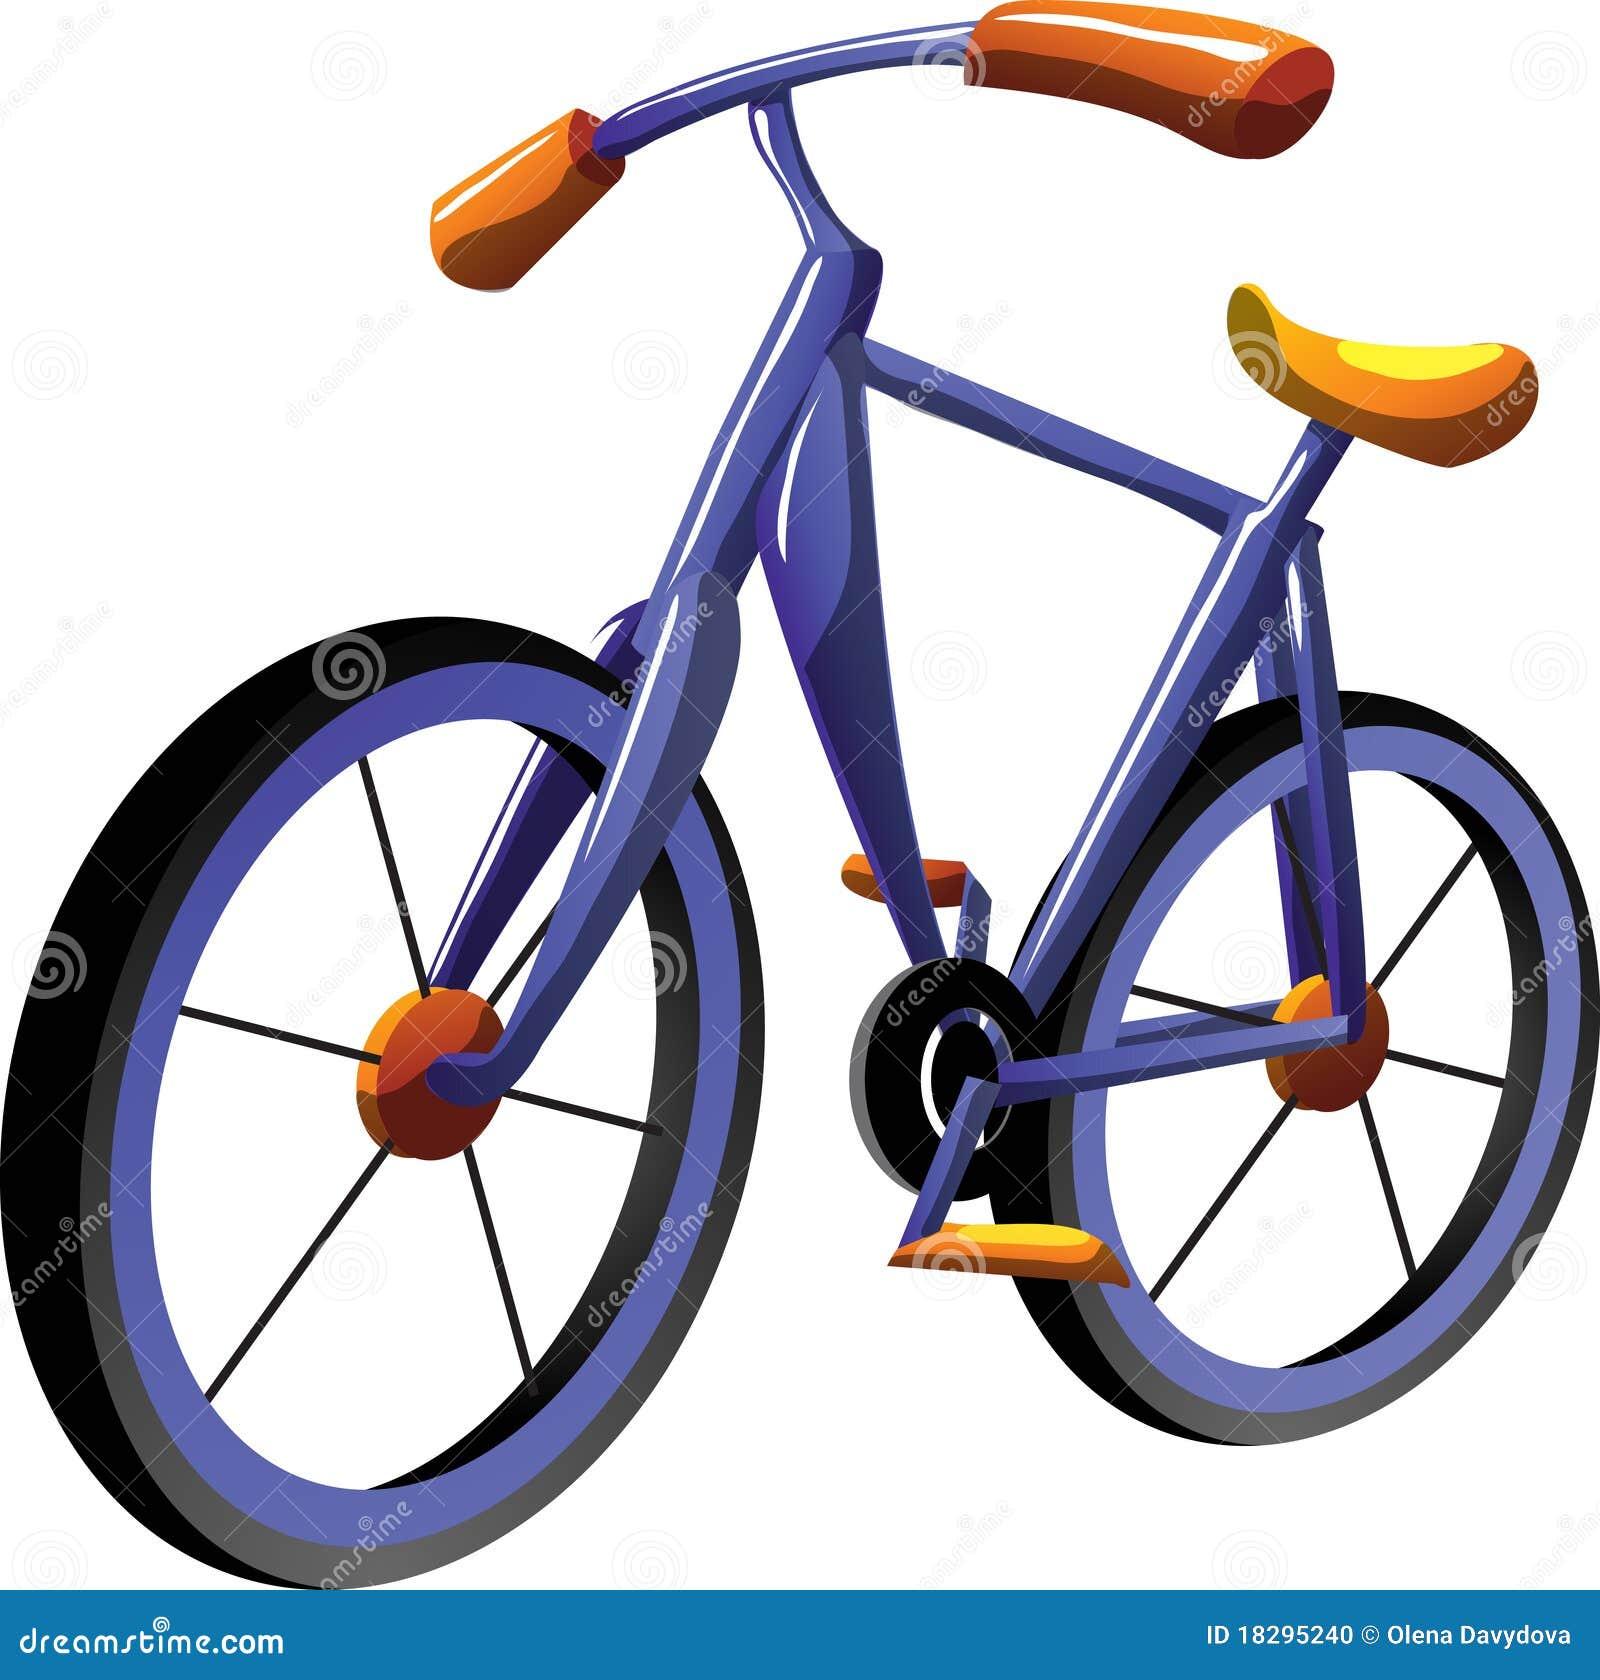 Cartoon Bike Stock Photo - Image: 18295240